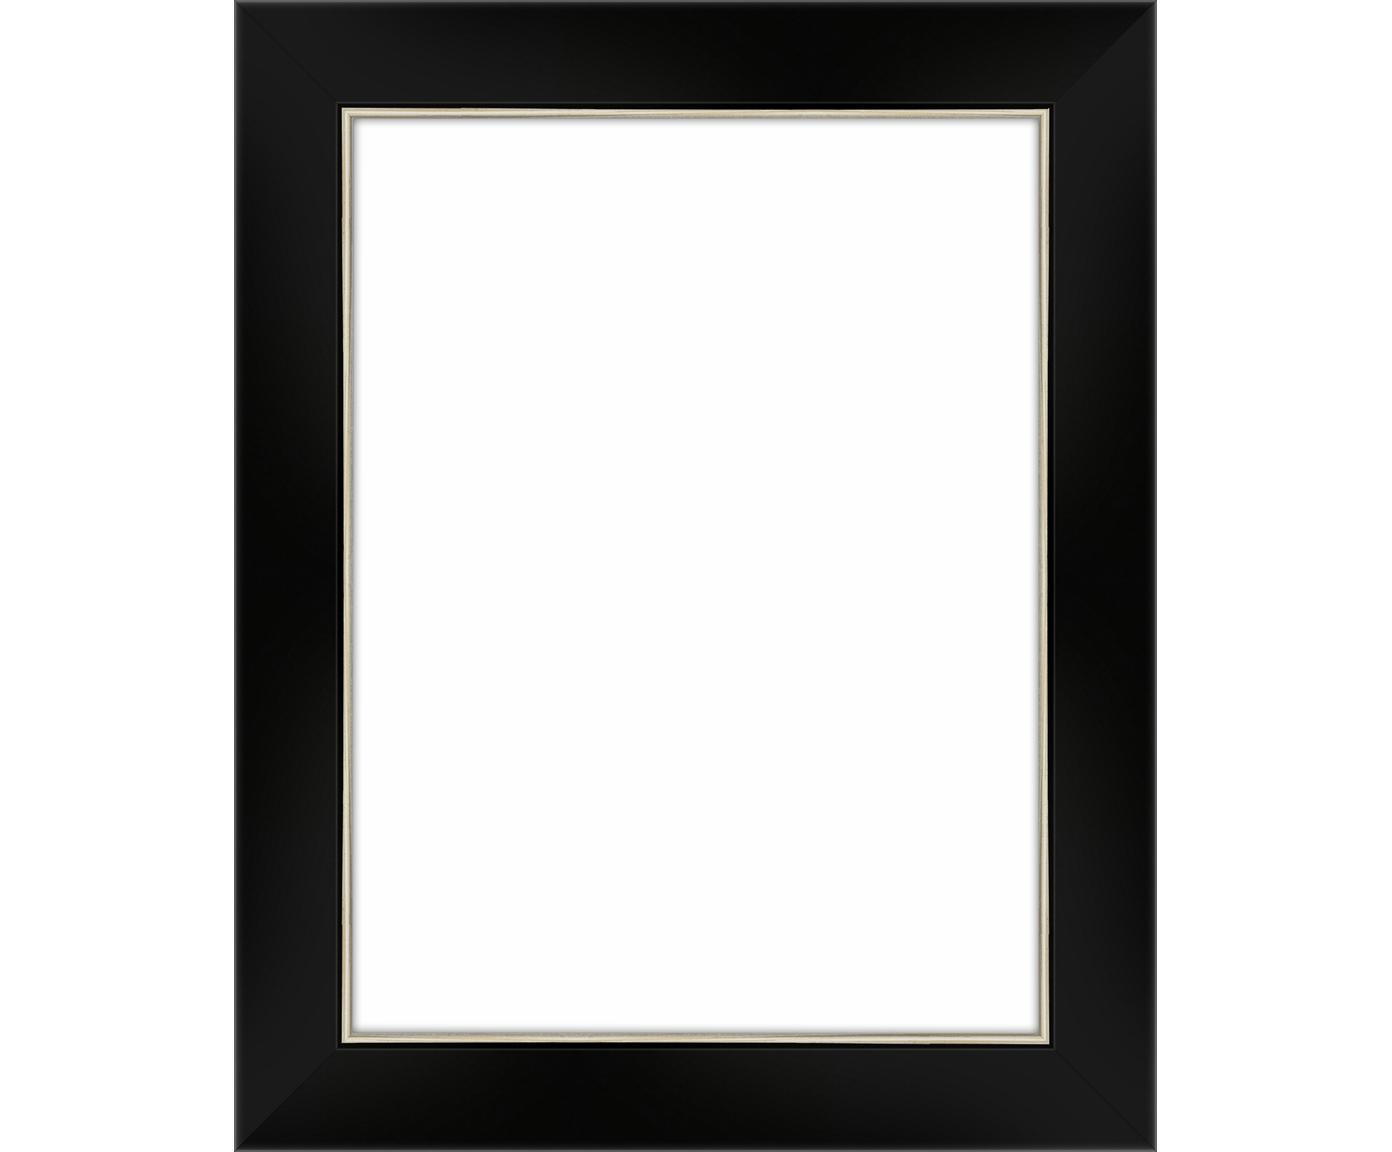 Fotolijstje Classico, Lijst: gelakt woudgrenenhout (pi, Zwart, 15 x 20 cm